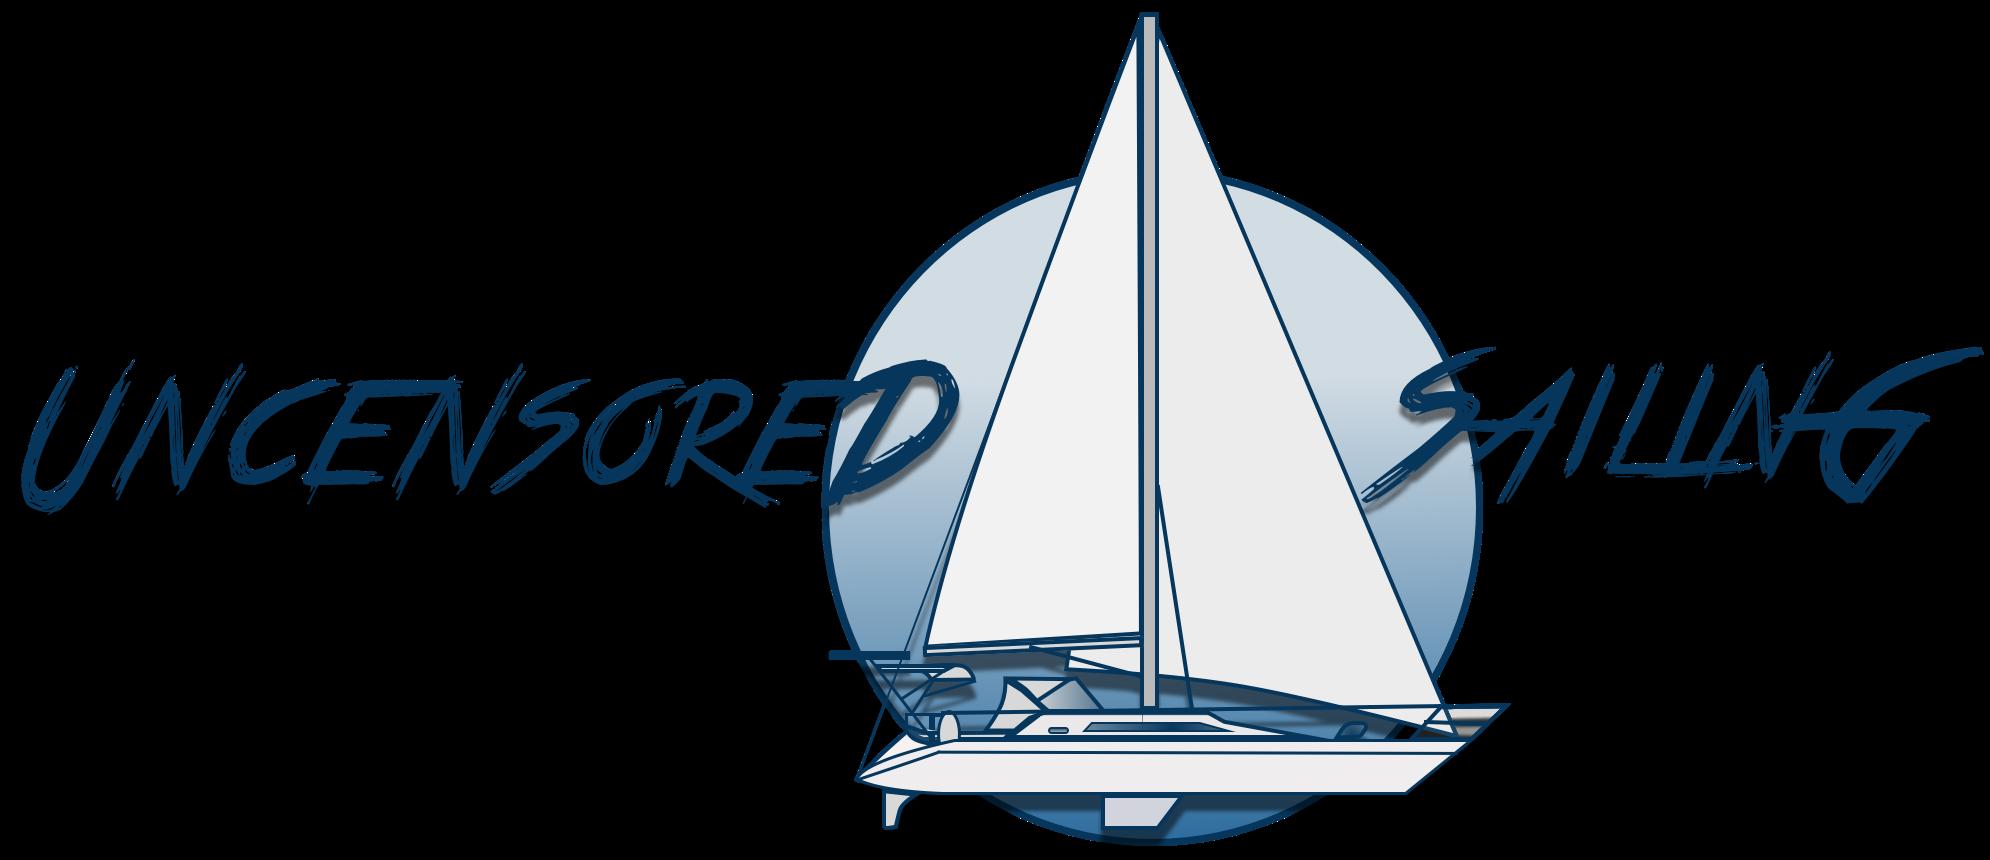 Uncensored Sailing